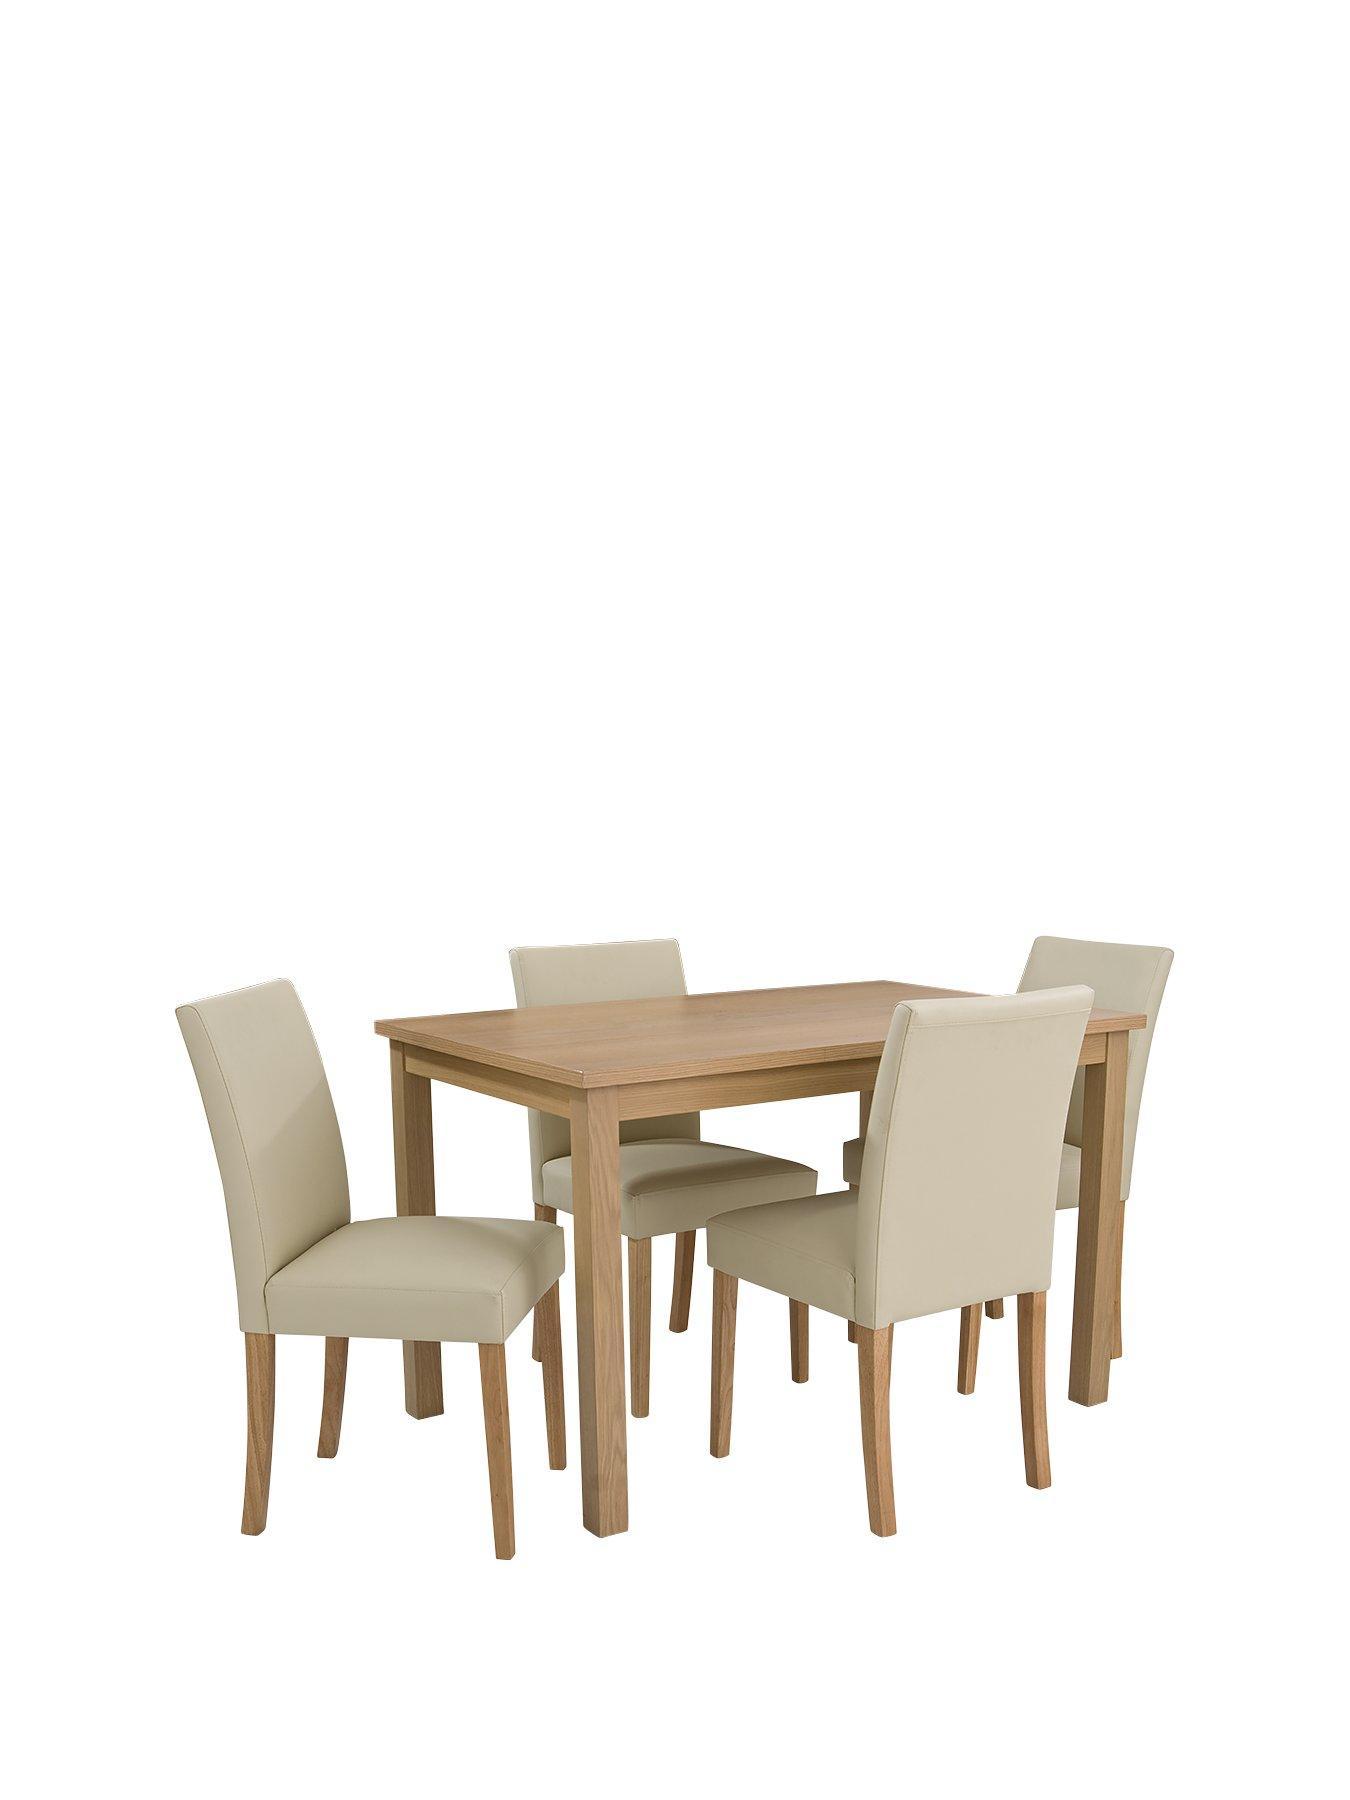 dining room sets co uk. dining room sets co uk